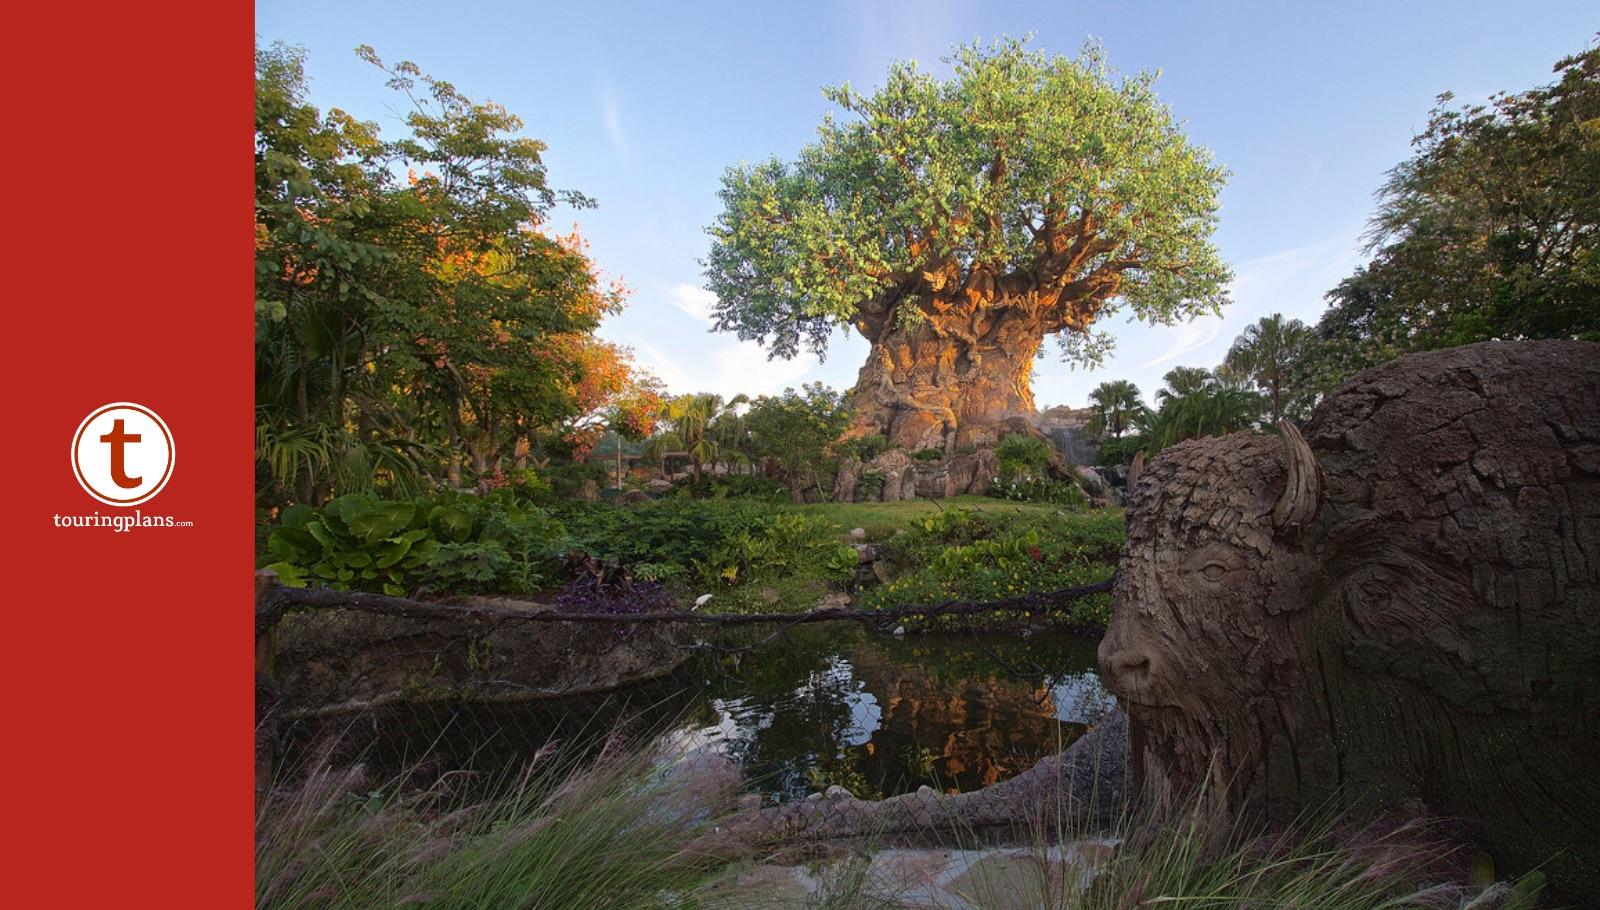 10 Reasons To Love Disney S Animal Kingdom On Its 22nd Anniversary Touringplans Com Blog